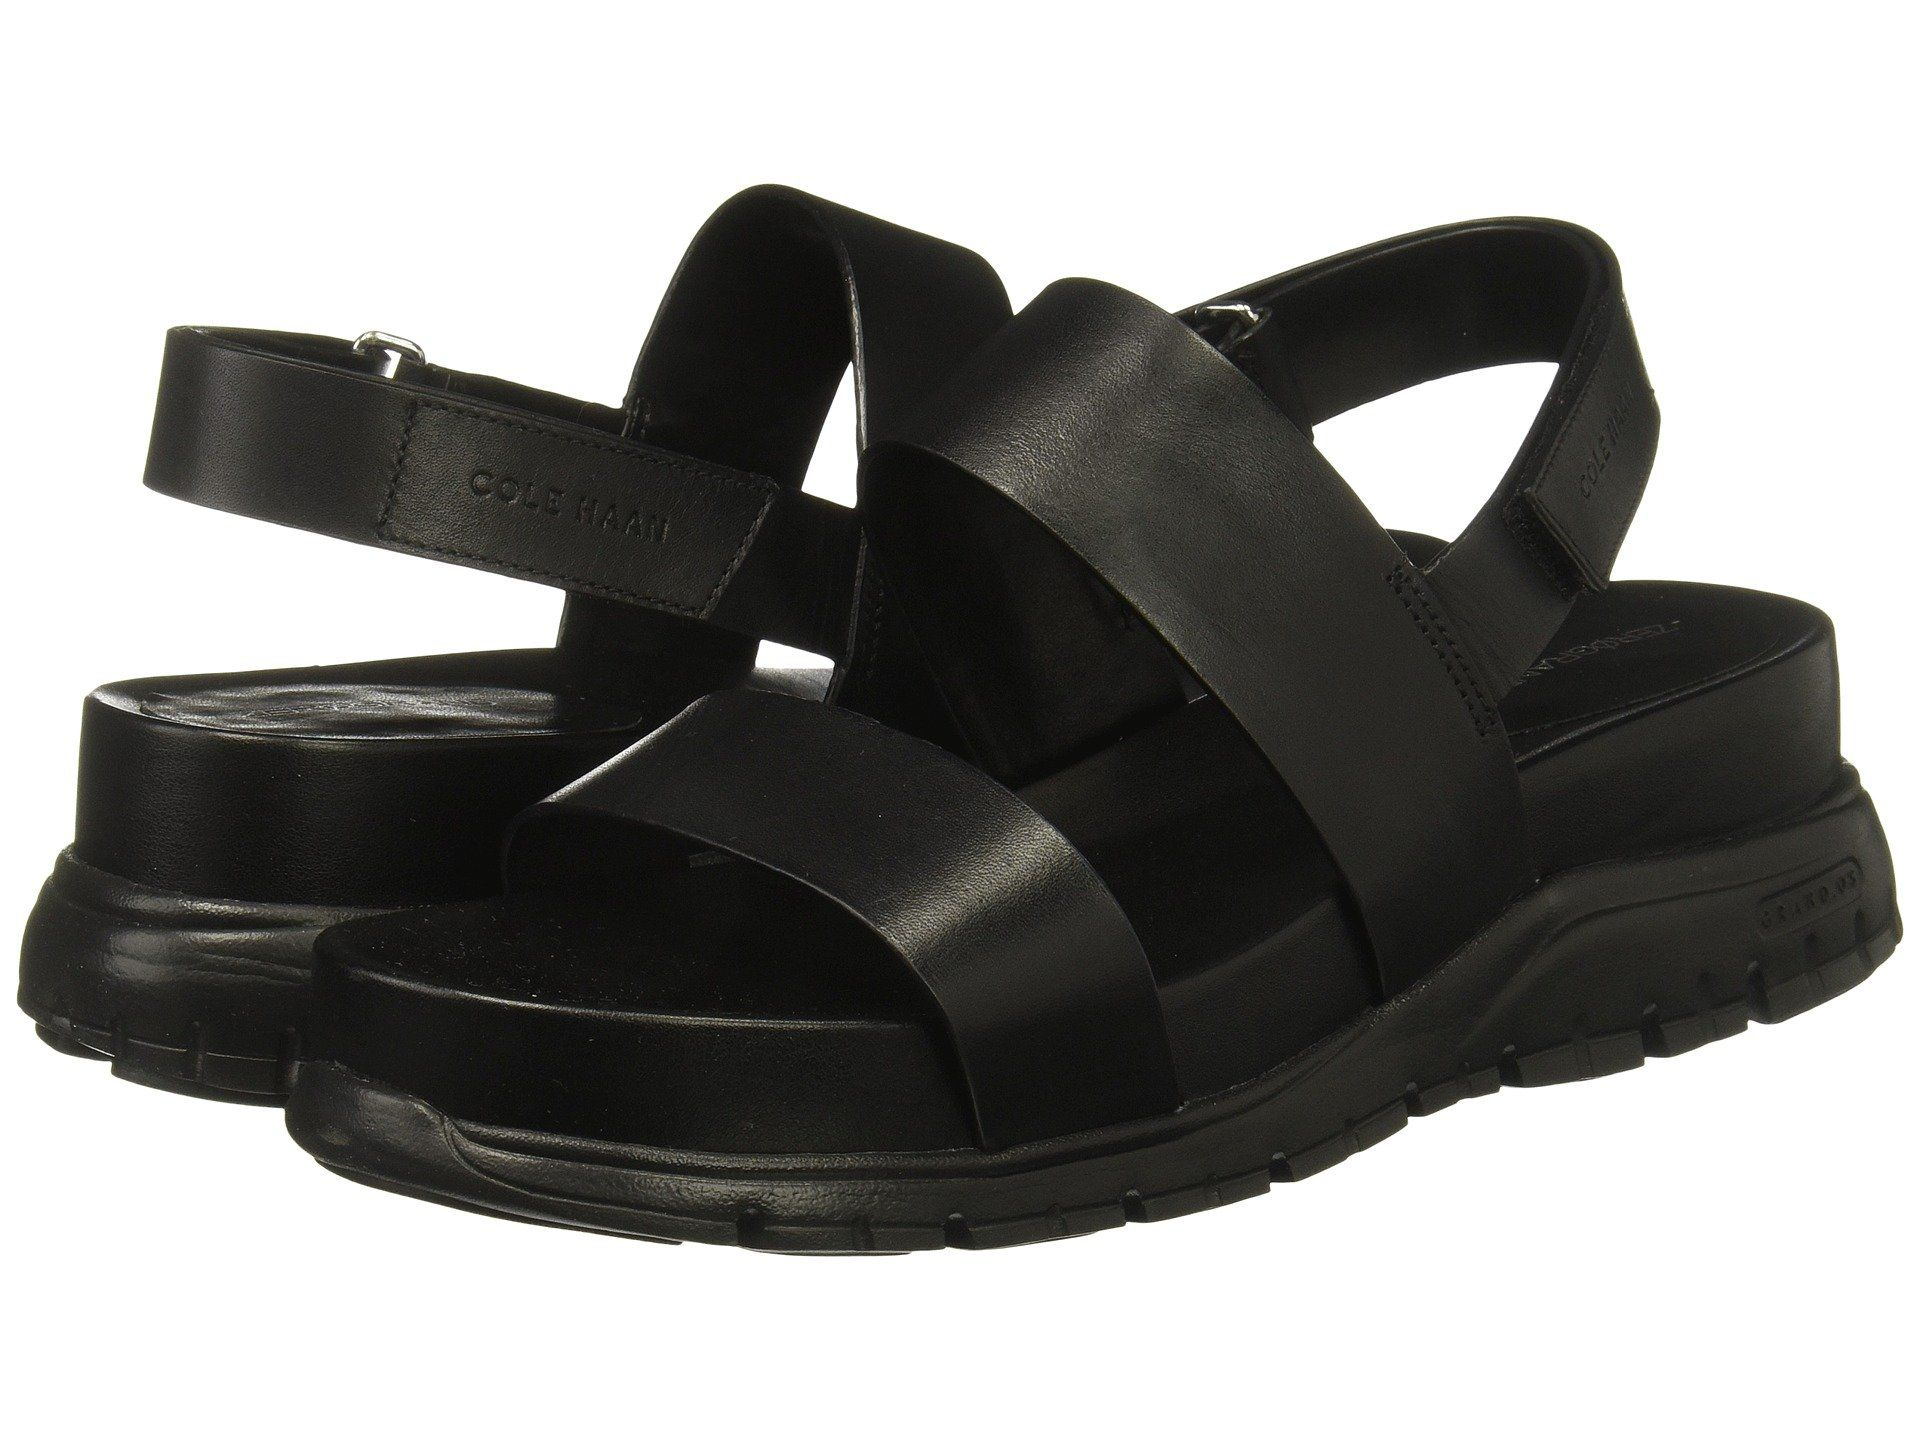 d6167d6d220a COLE HAAN Zerogrand Slide Sandal.  colehaan  shoes